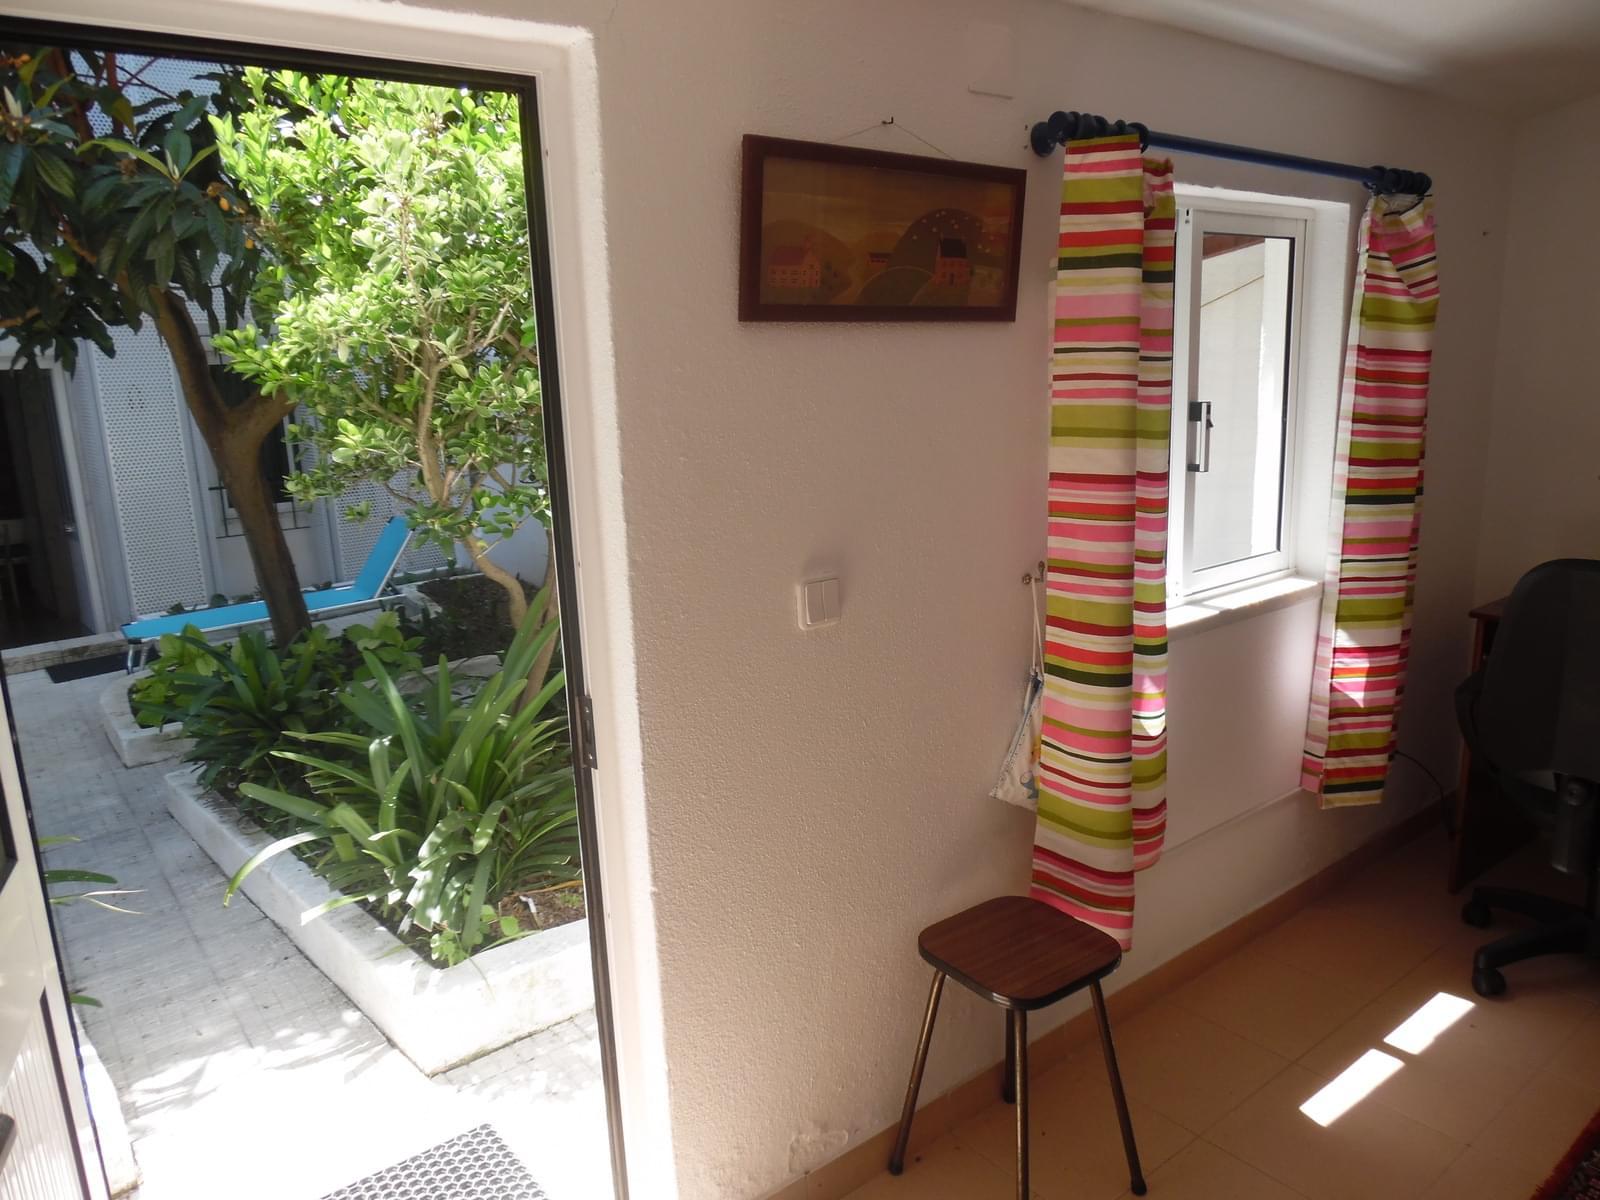 pf17147-apartamento-t2-lisboa-8d8e8580-714e-4ad9-aed1-b60322c2164d